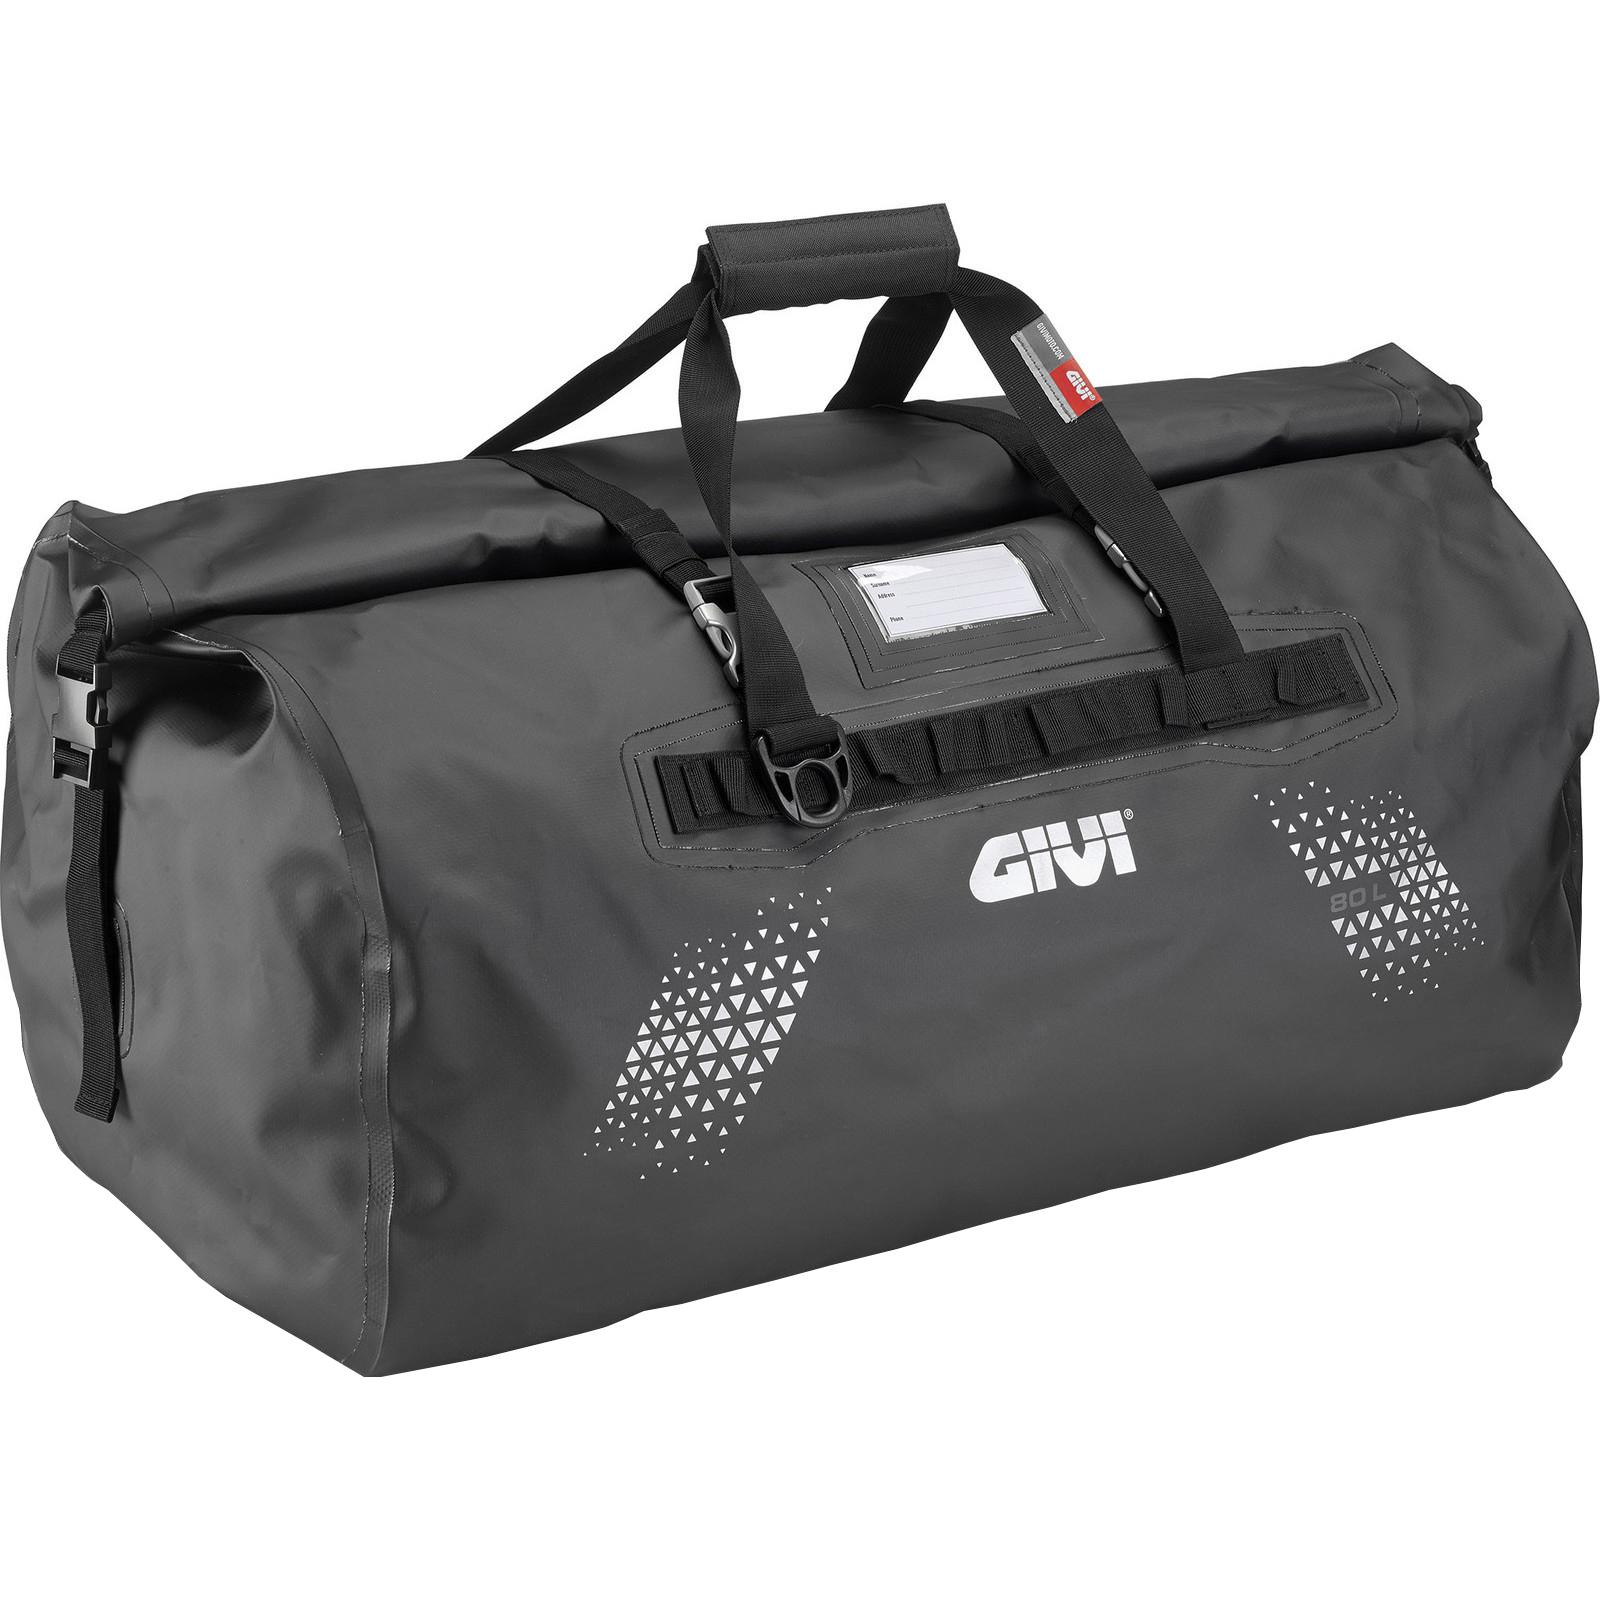 Givi Ultima T Range Waterproof Cargo Bag 80l Black Ut804